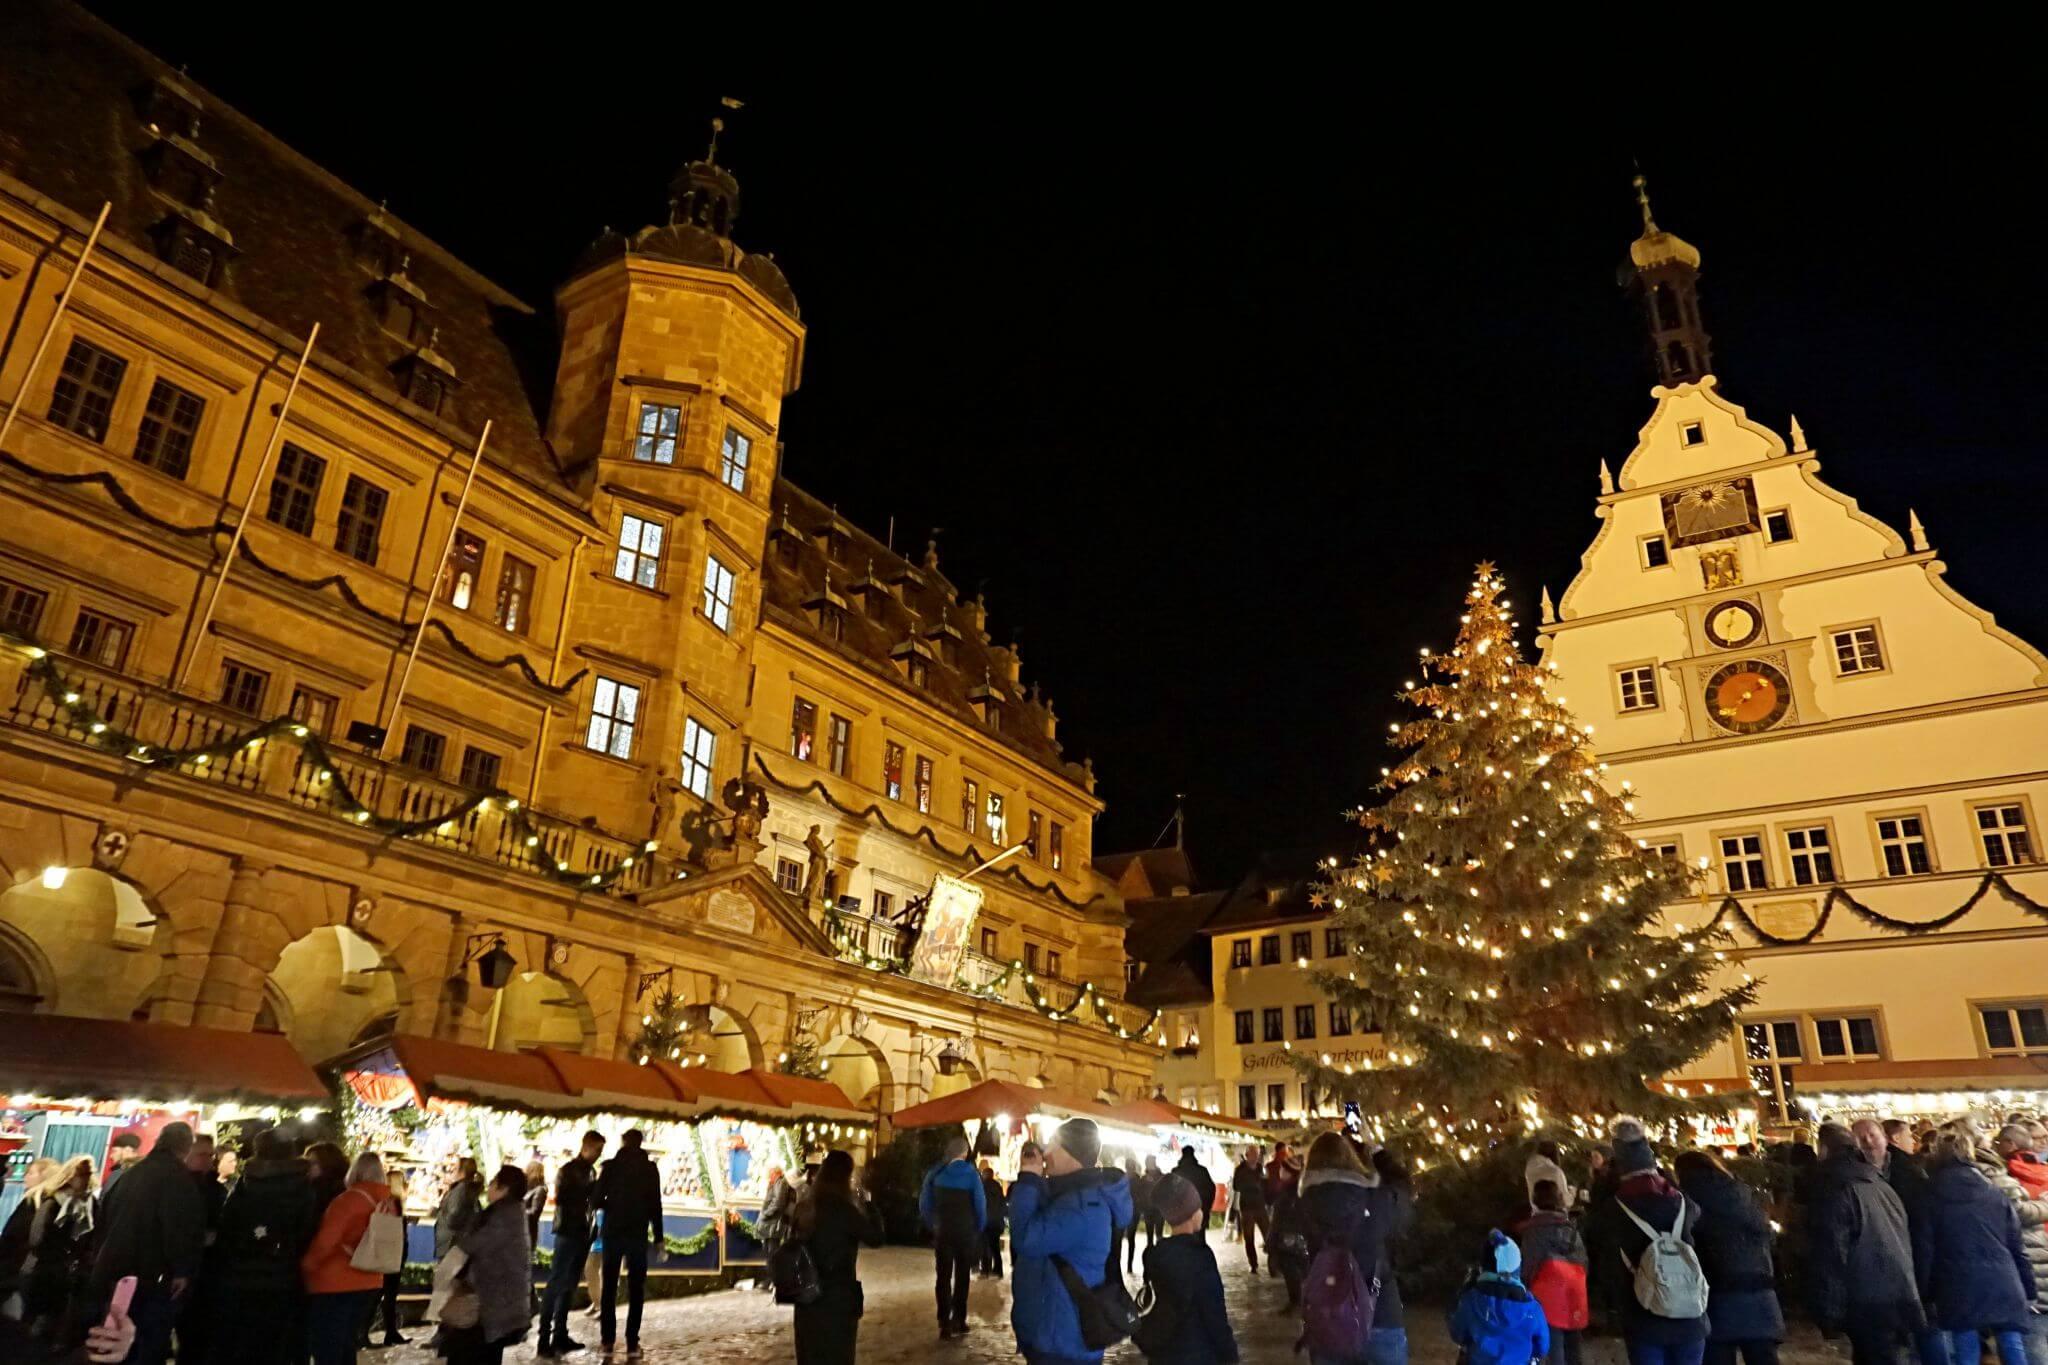 La Marktplaz en Navidad